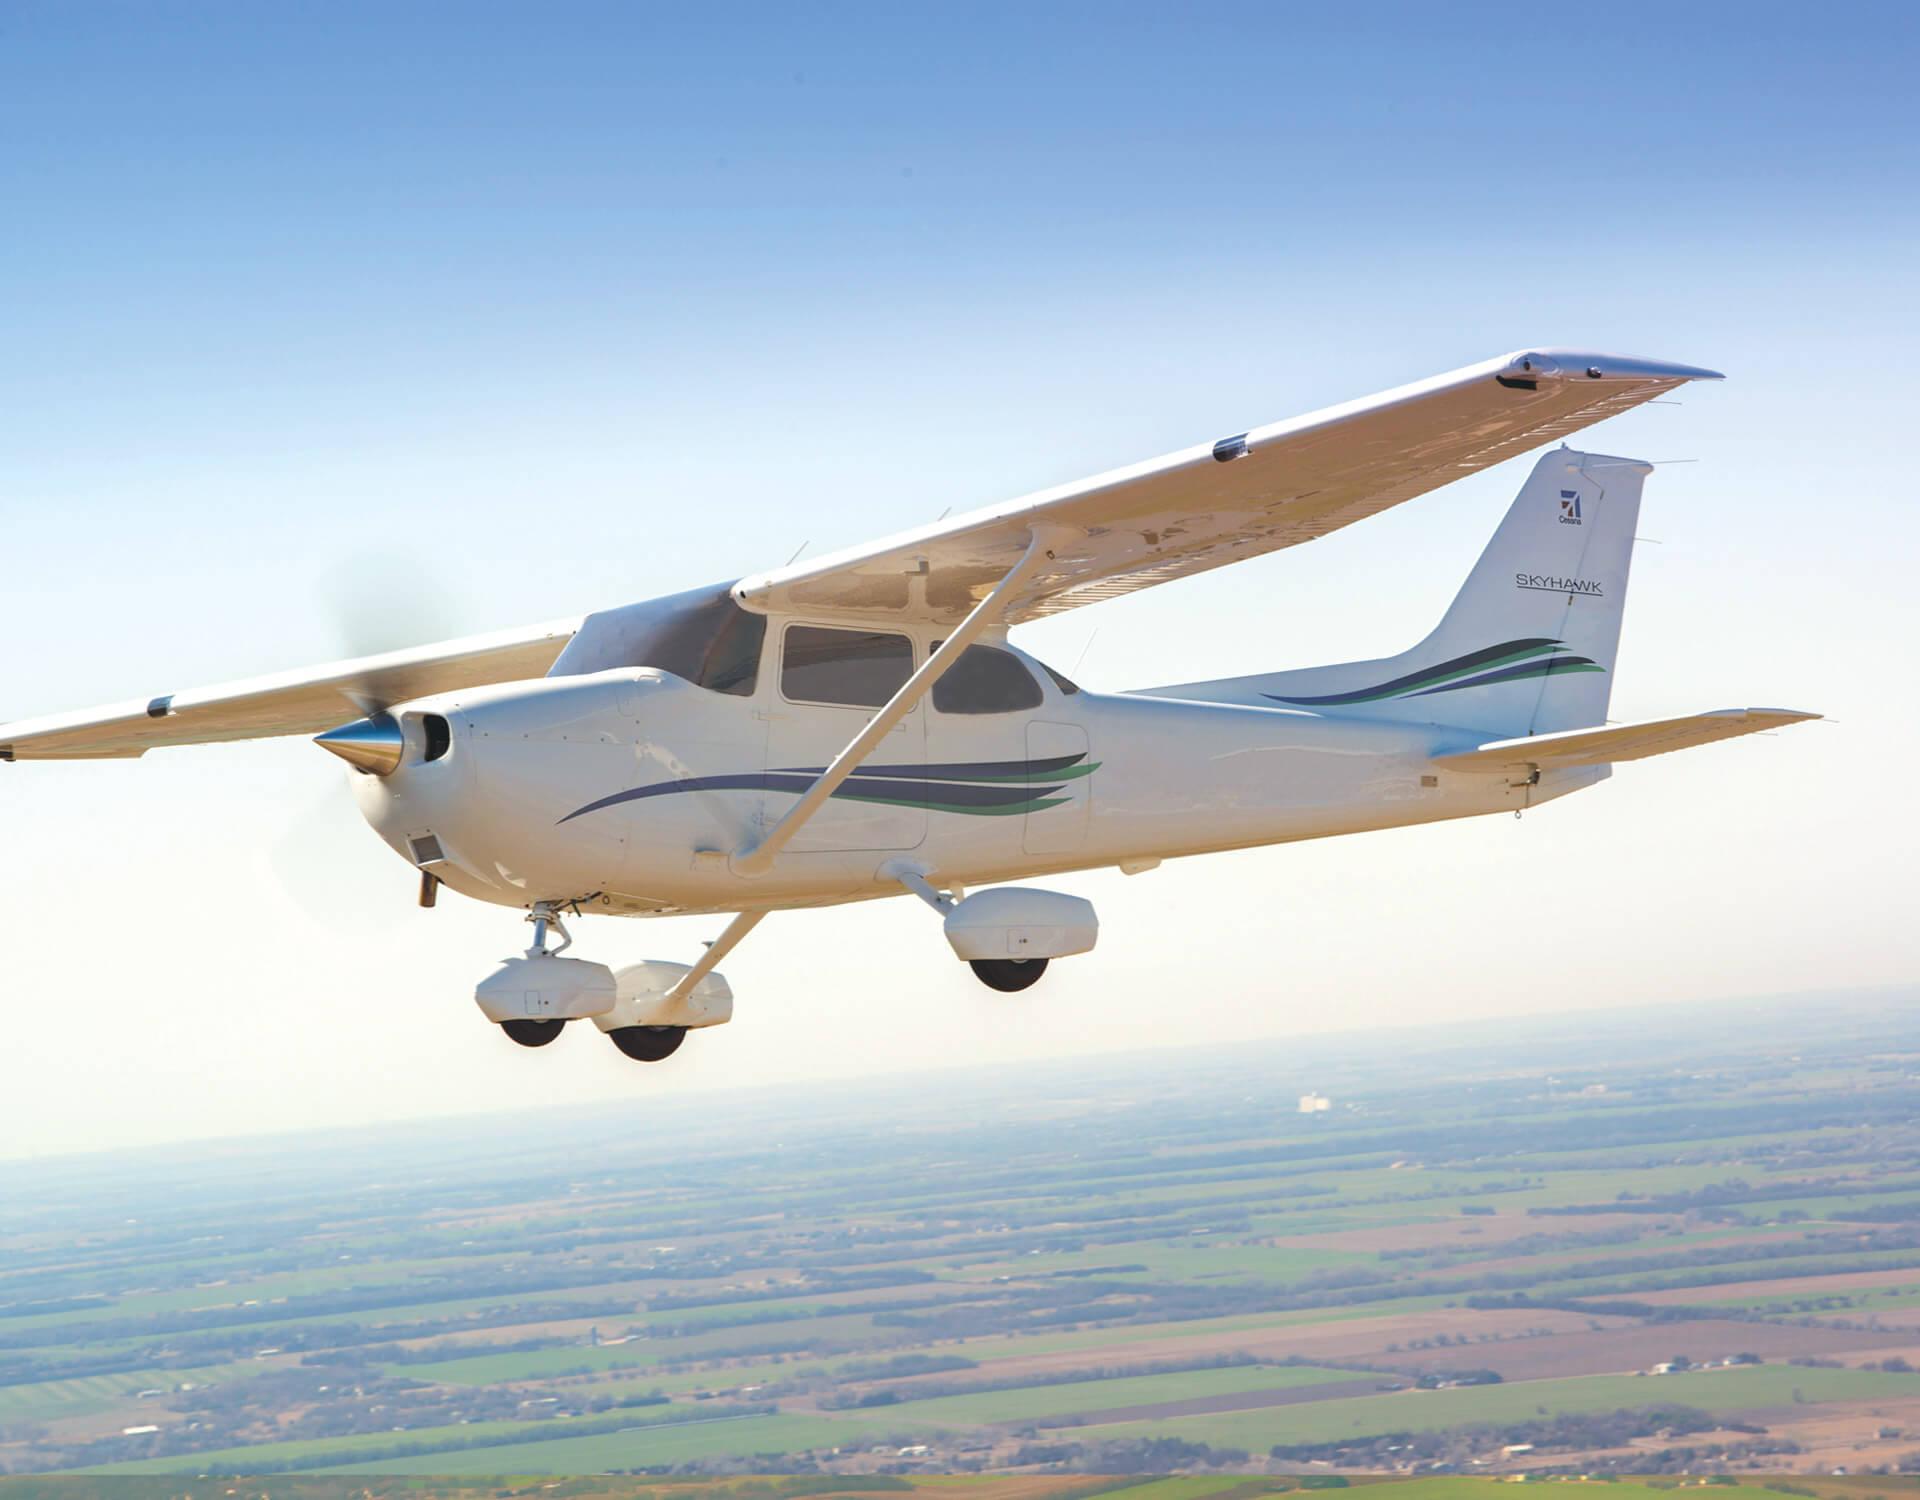 Ground School Cessna C172